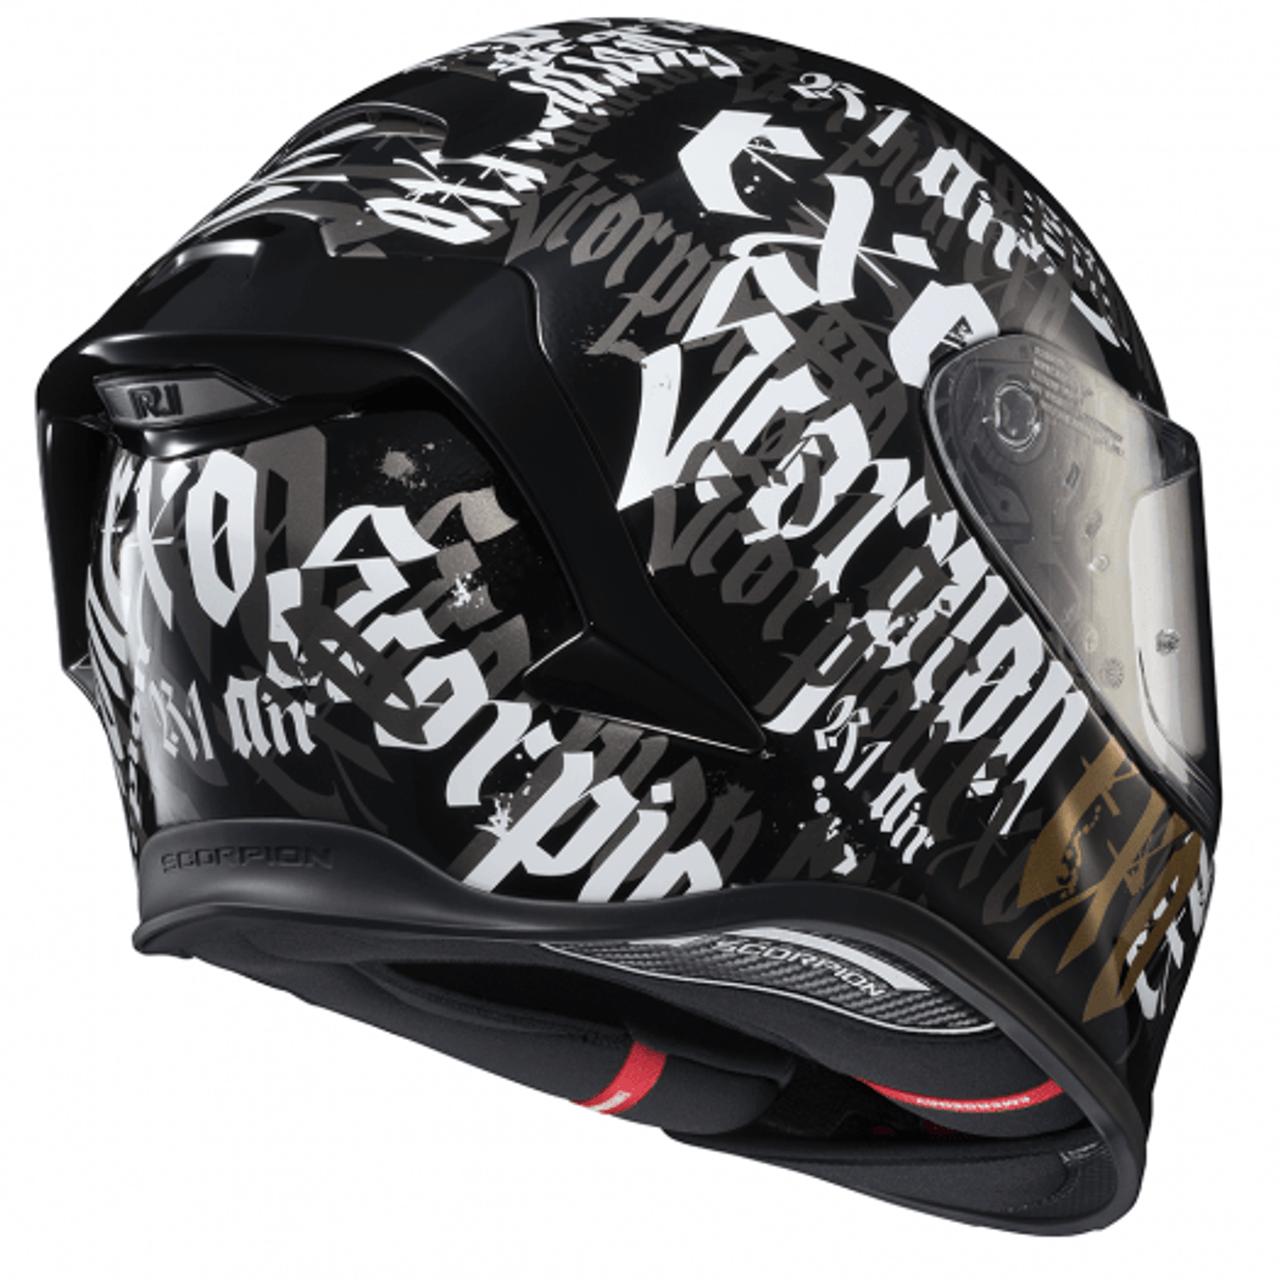 NEW ICON Variant Helmet Face Shield DARK SMOKE FREE SHIP GSXR CBR R6 ZX R1